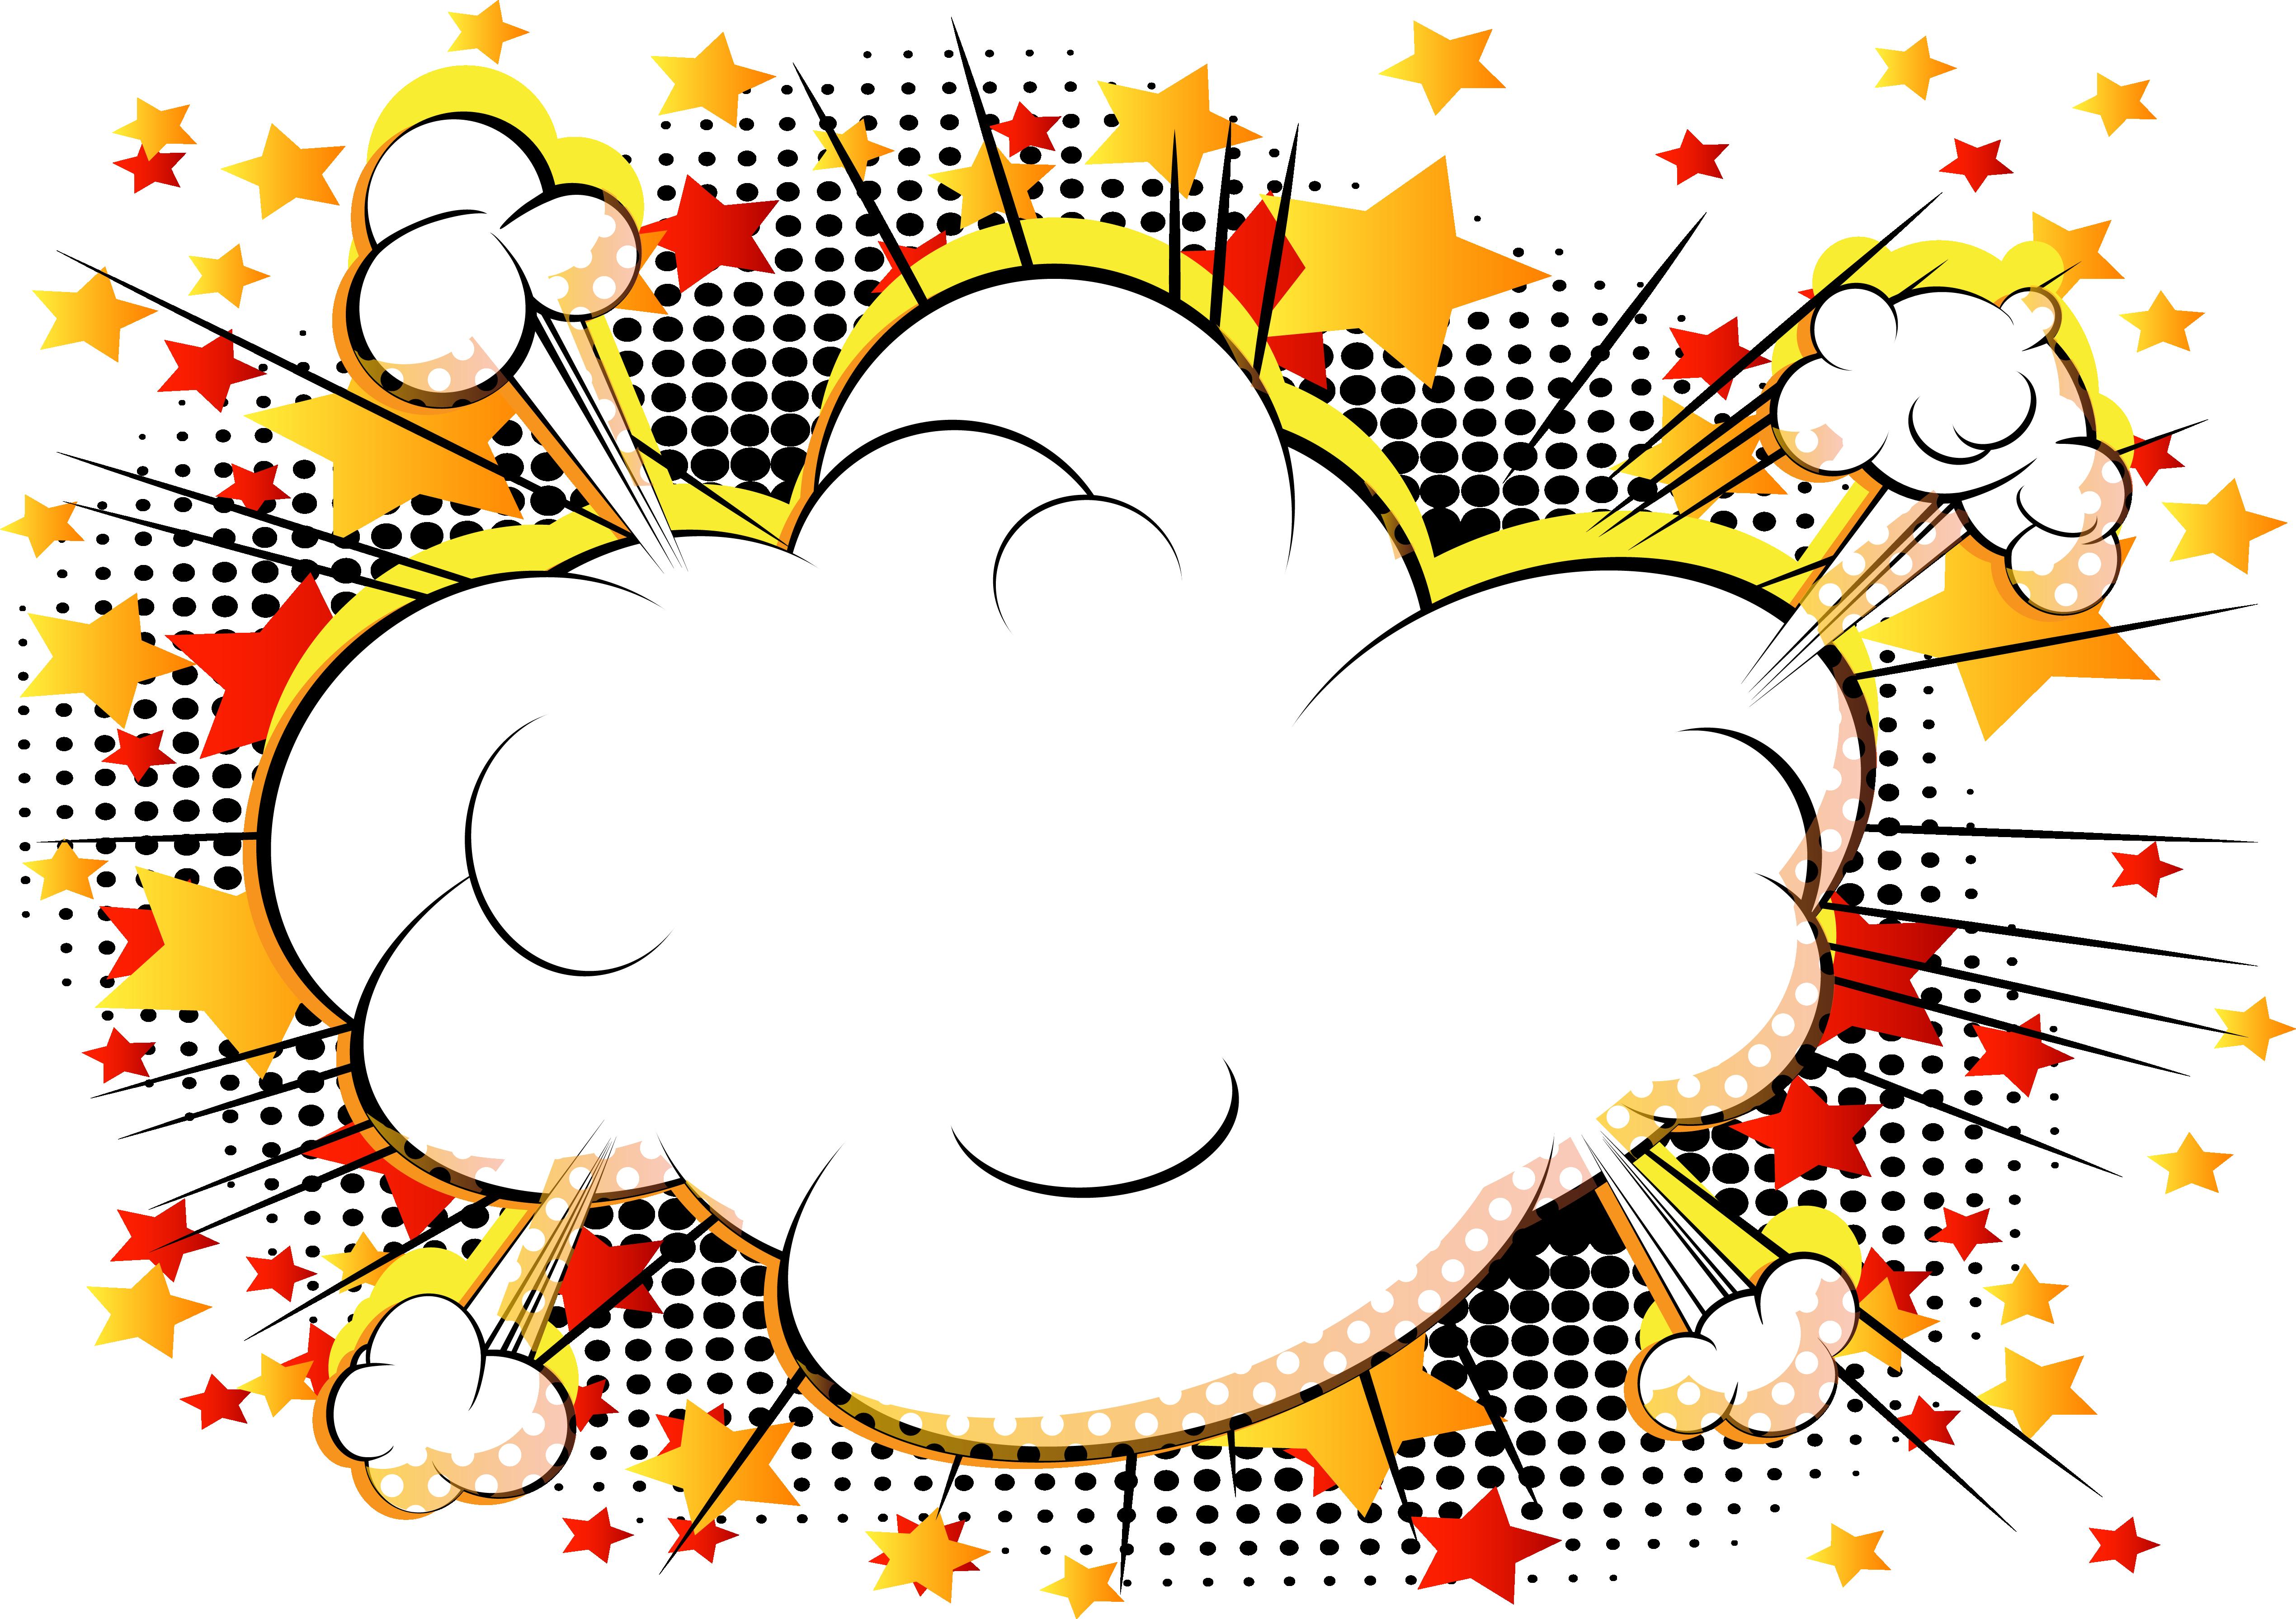 5079x3582 Comics Cartoon Explosion Comic Book